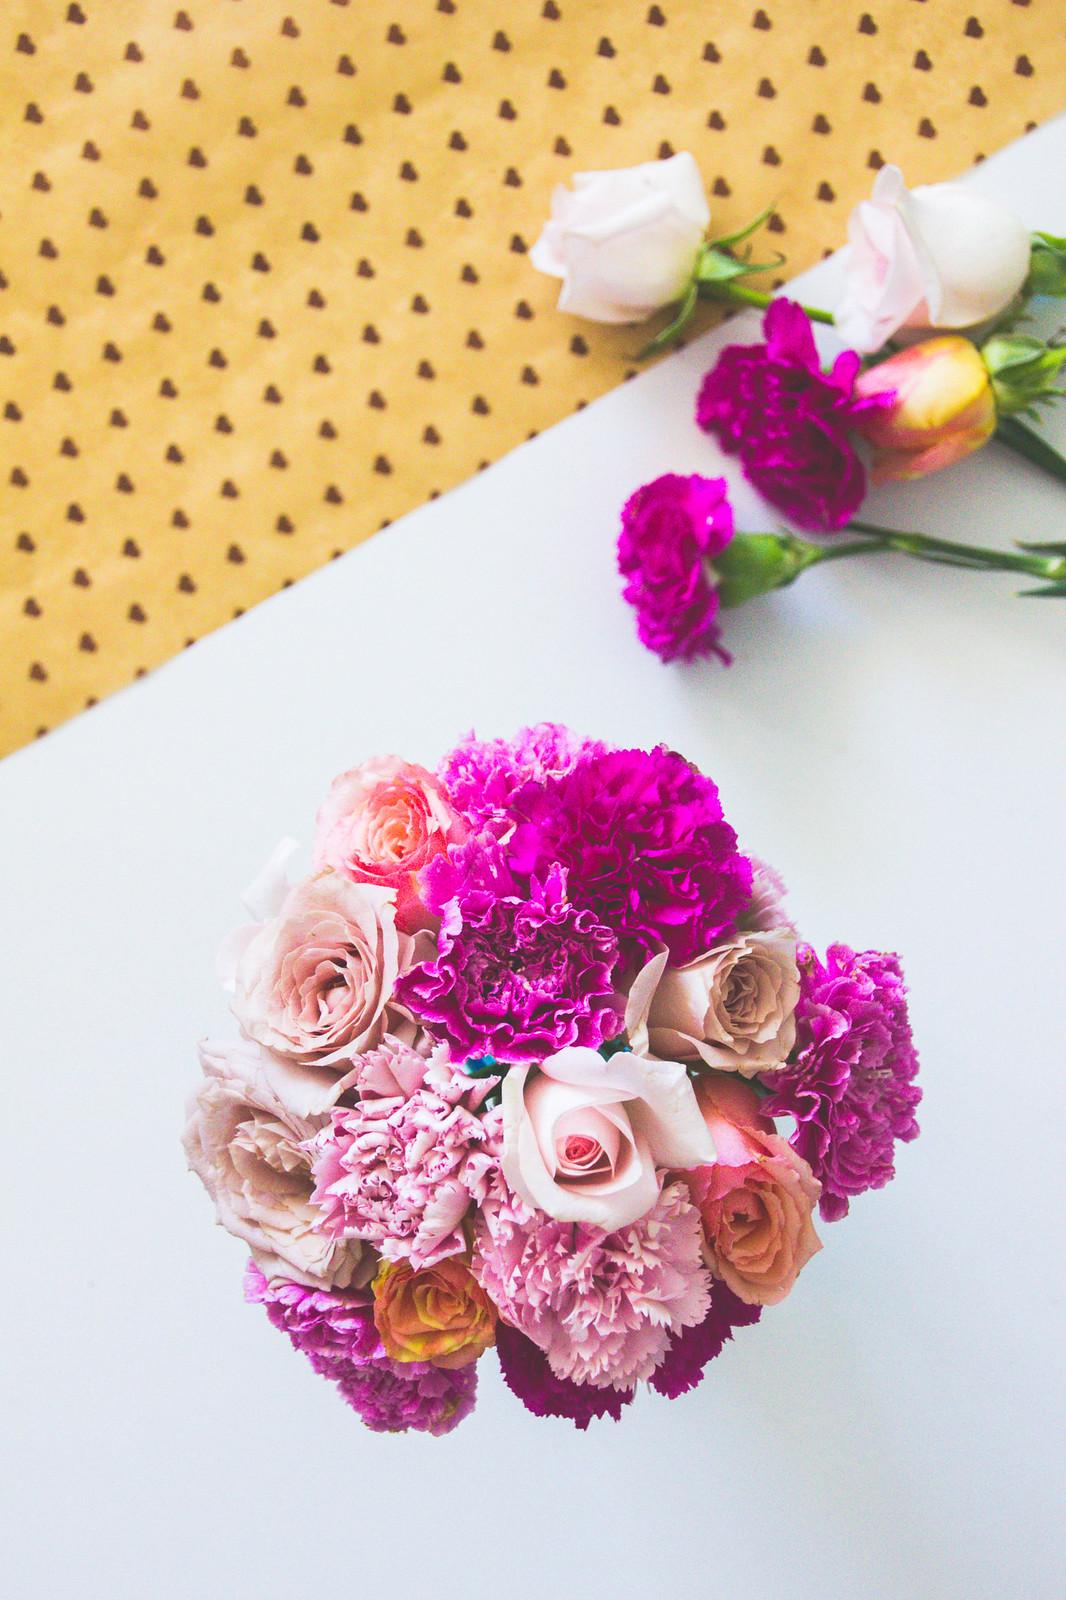 valentines-day-flowers-diy